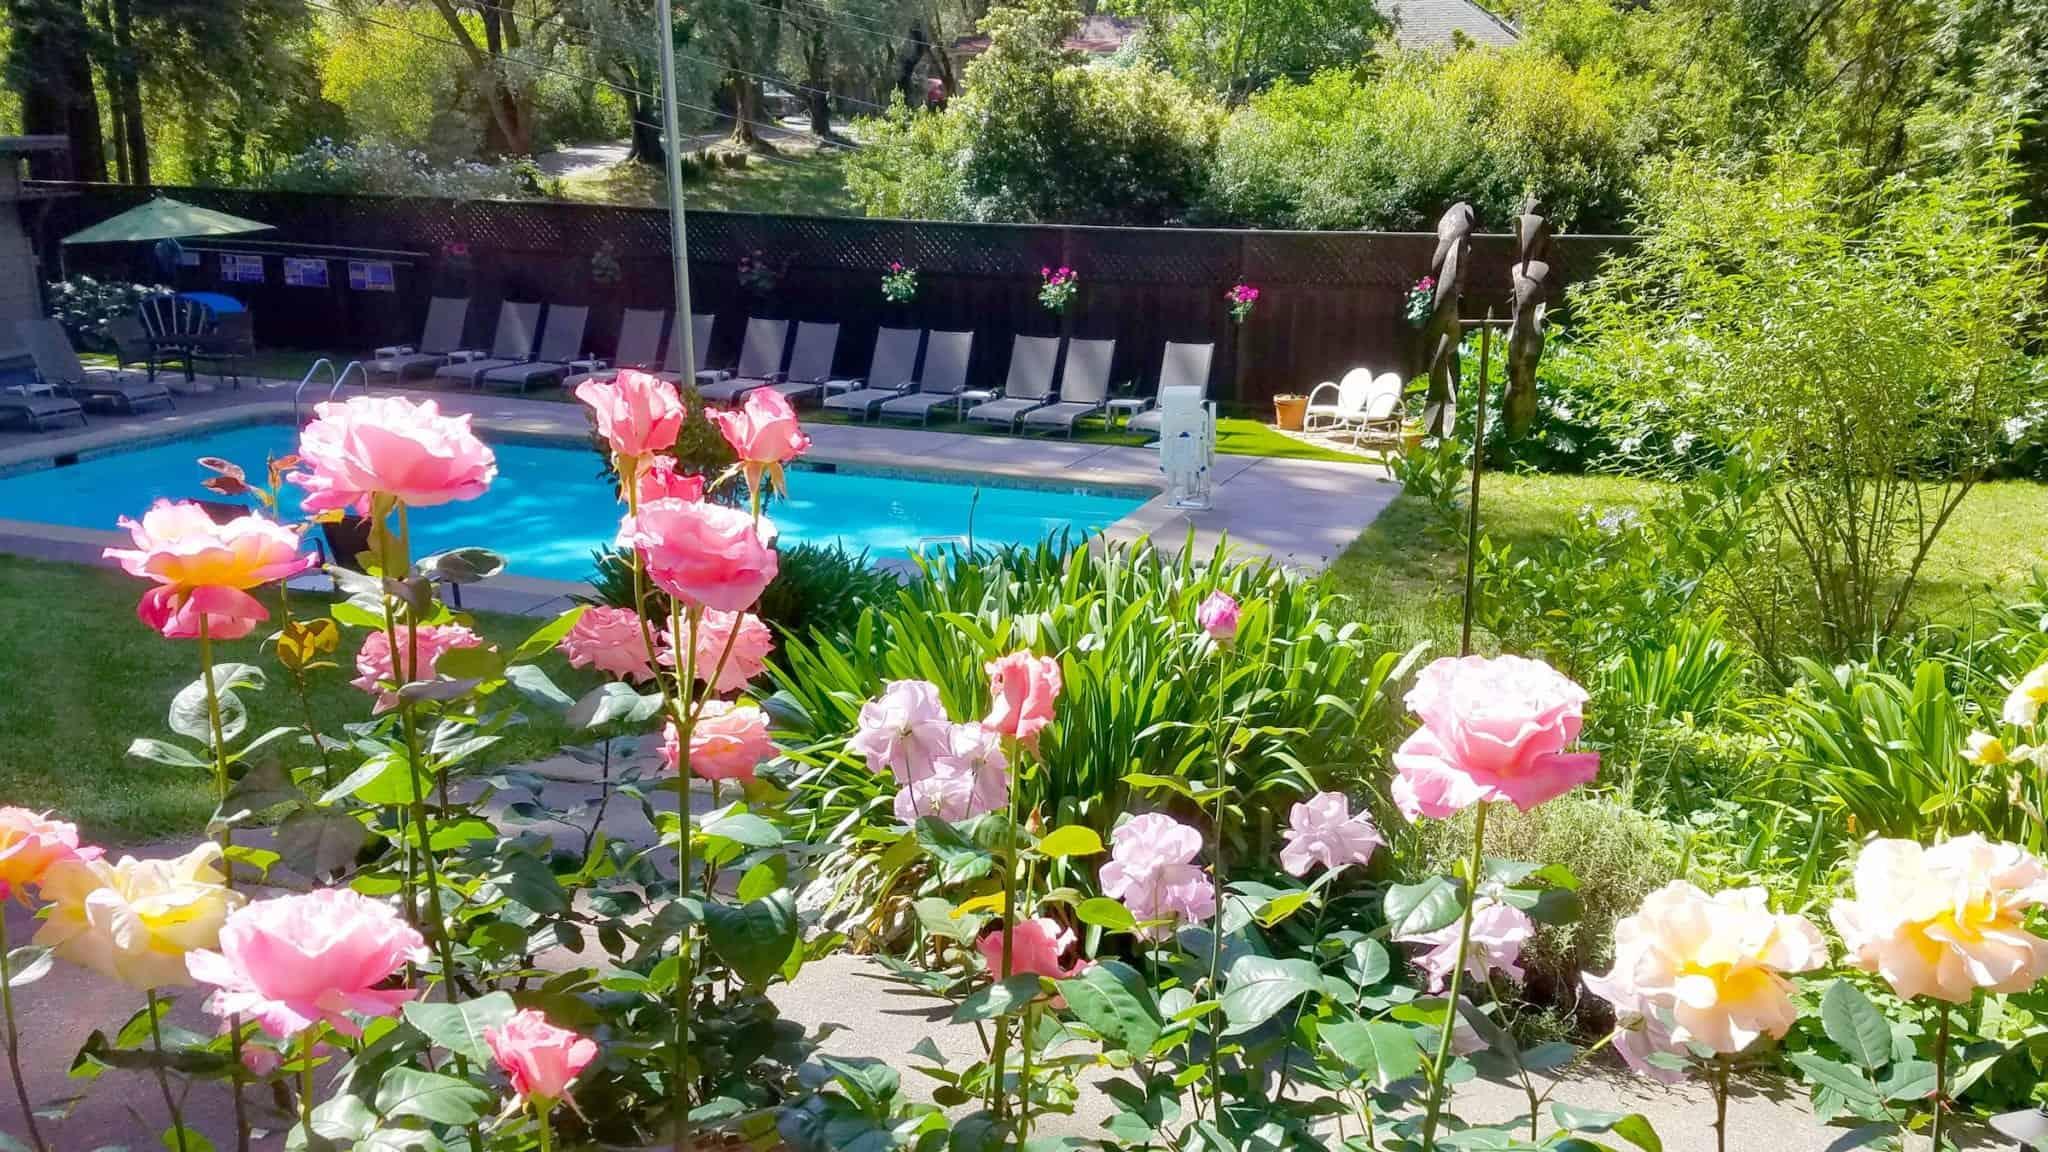 Sunny roses at pool